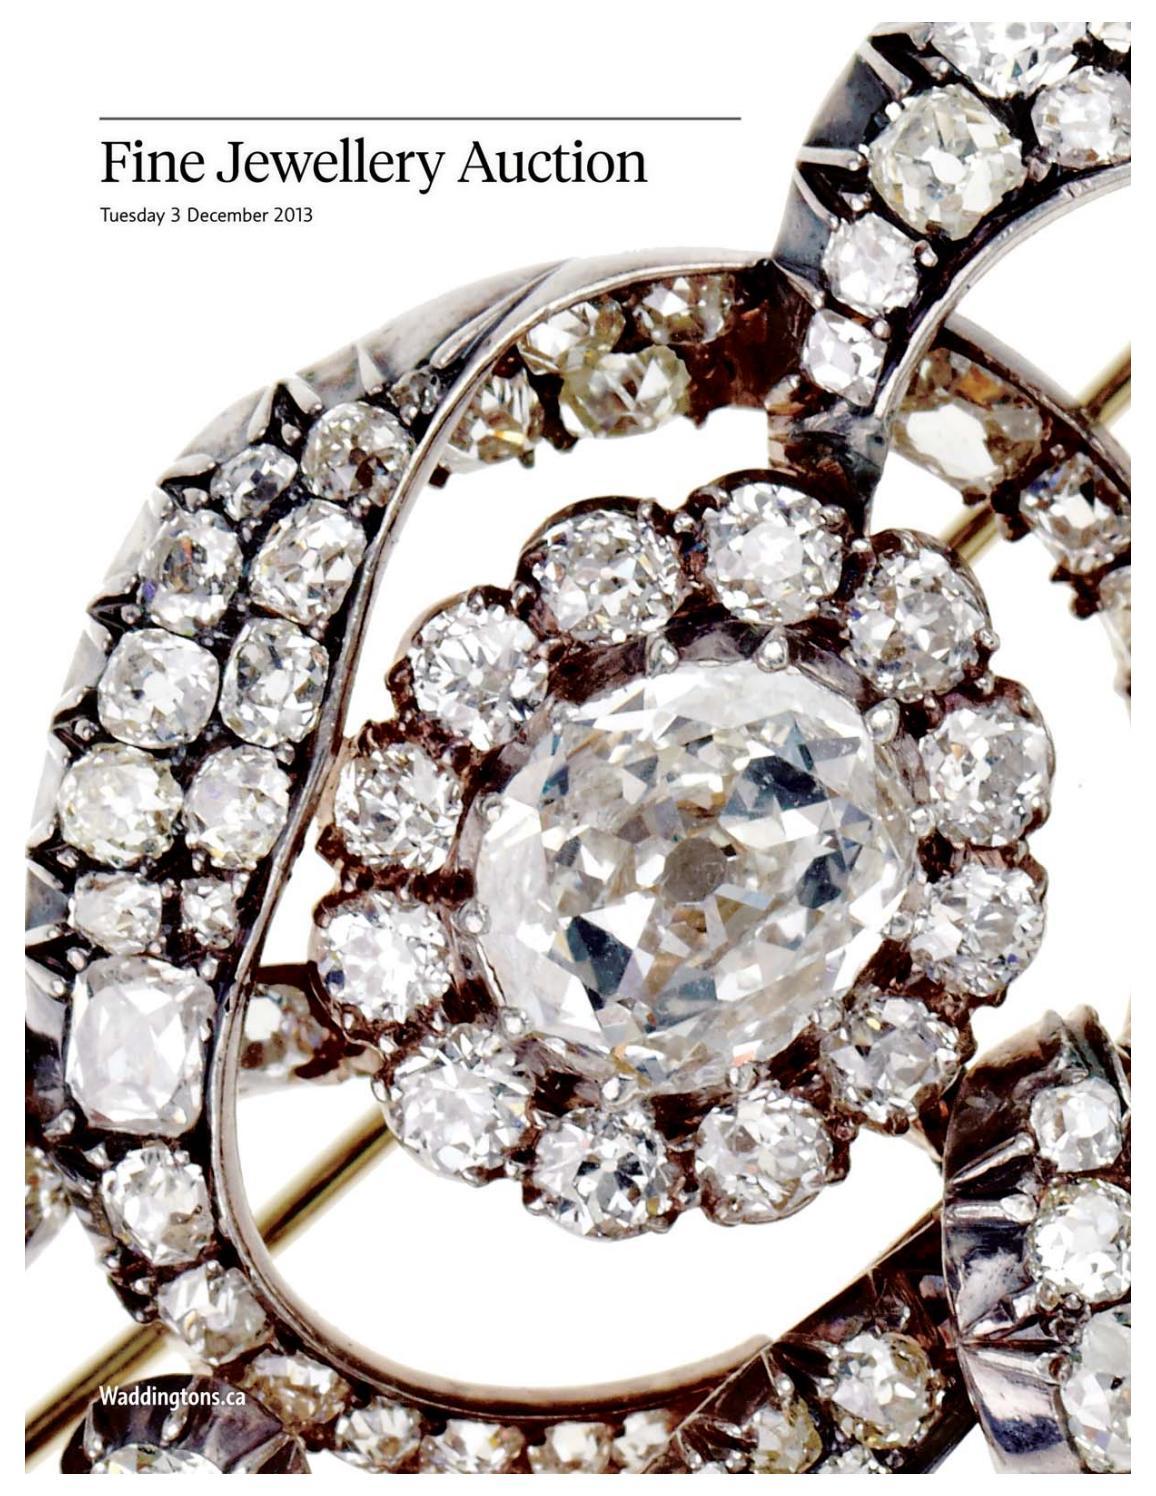 Fine Jewellery Auction Dec 3 2013 By Waddingtons Issuu